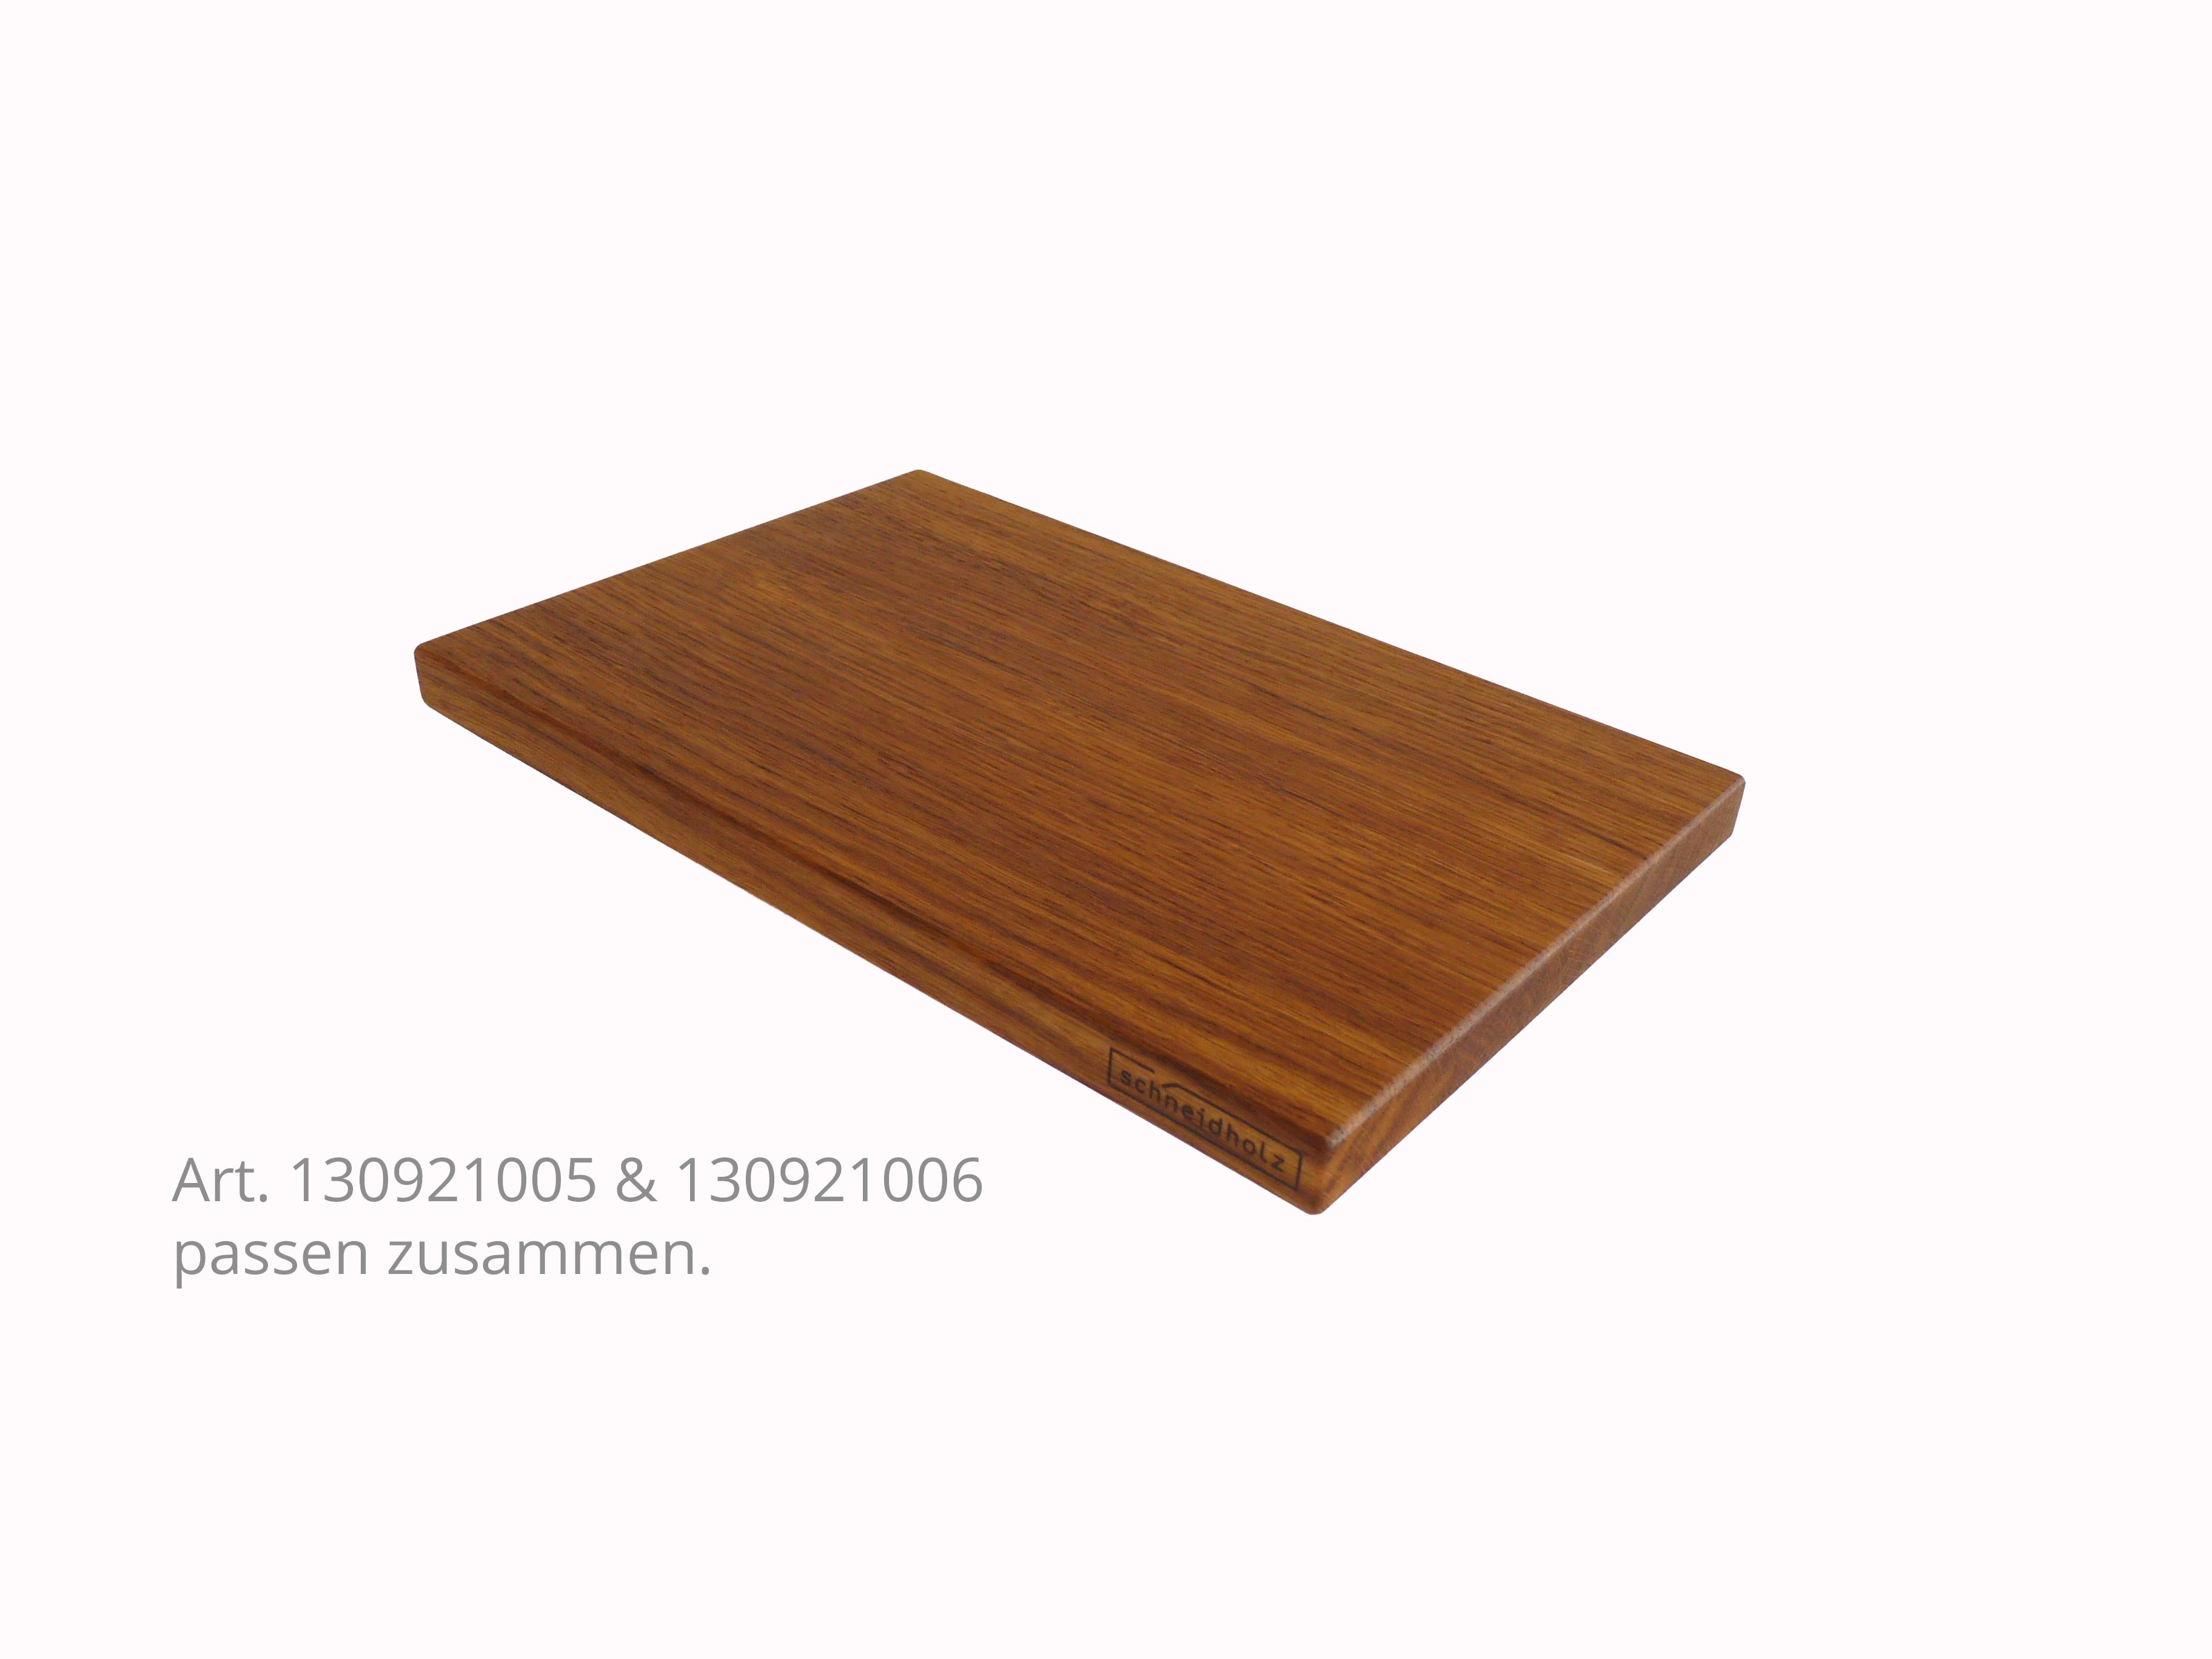 Kleinholzbrett - Kupfereiche